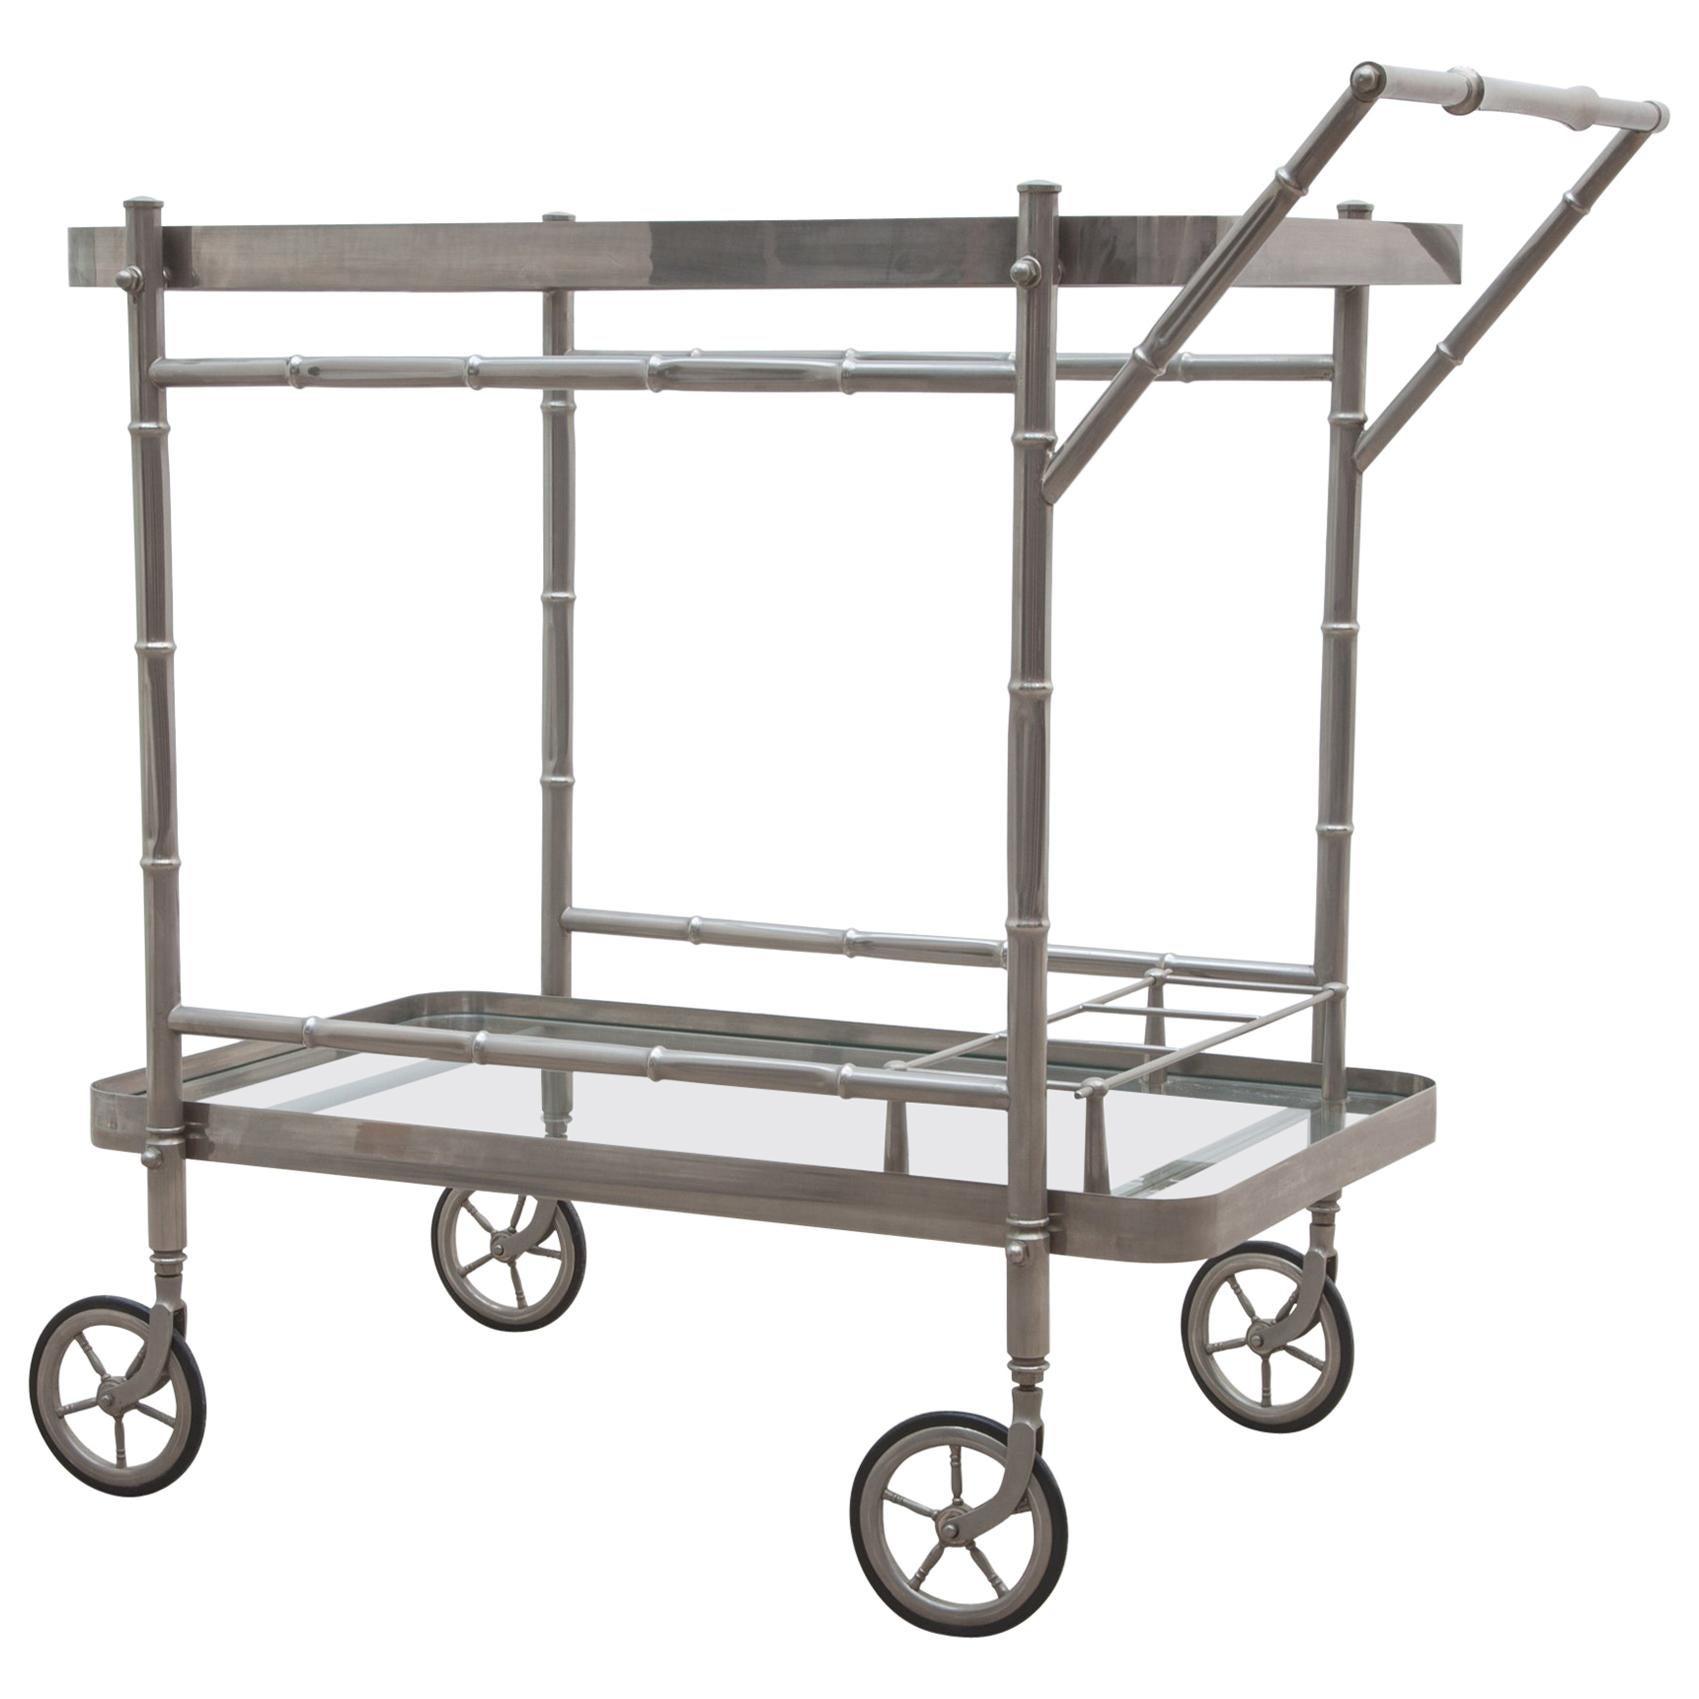 Elegant Bar Cart Faux Bamboo Designed in Chrome by Maison Baguès, 1940s